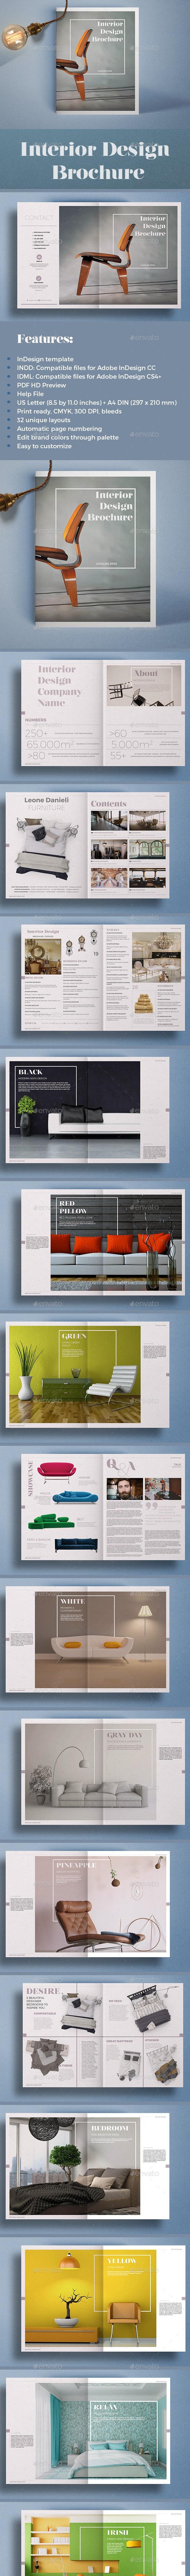 Interior Design Brochure - Catalogs Brochures